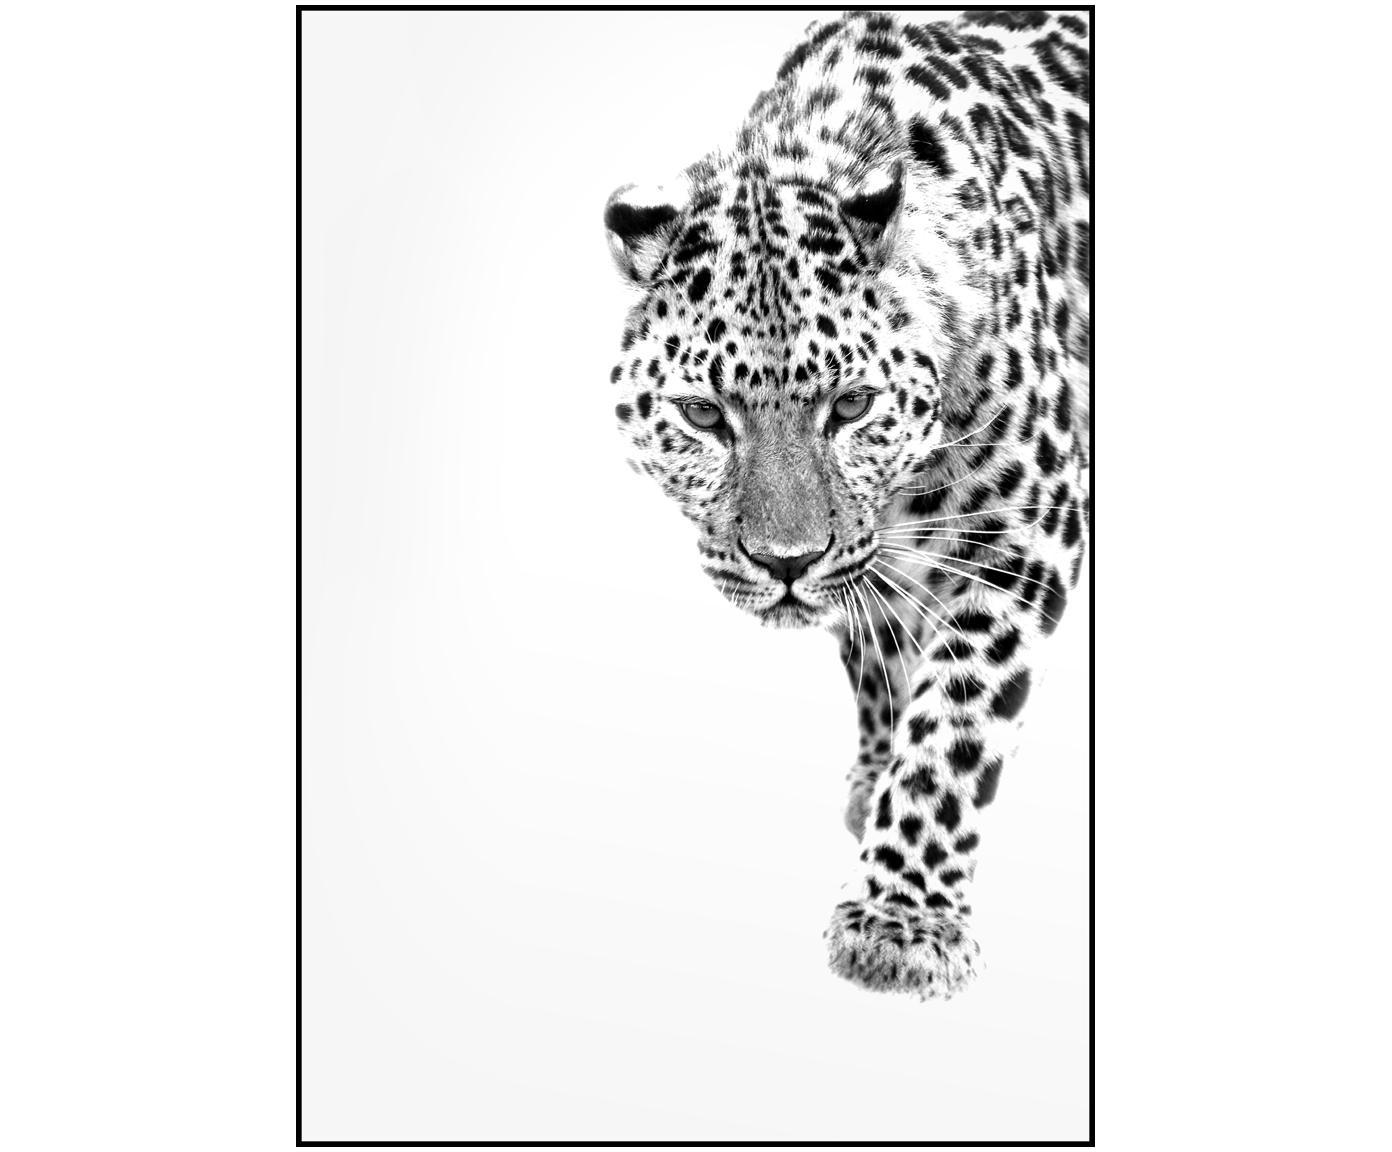 Ingelijste digitale print White Leopard, Afbeelding: digitale druk op papier (, Lijst: gelakt HDF, Zwart, wit, 30 x 40 cm